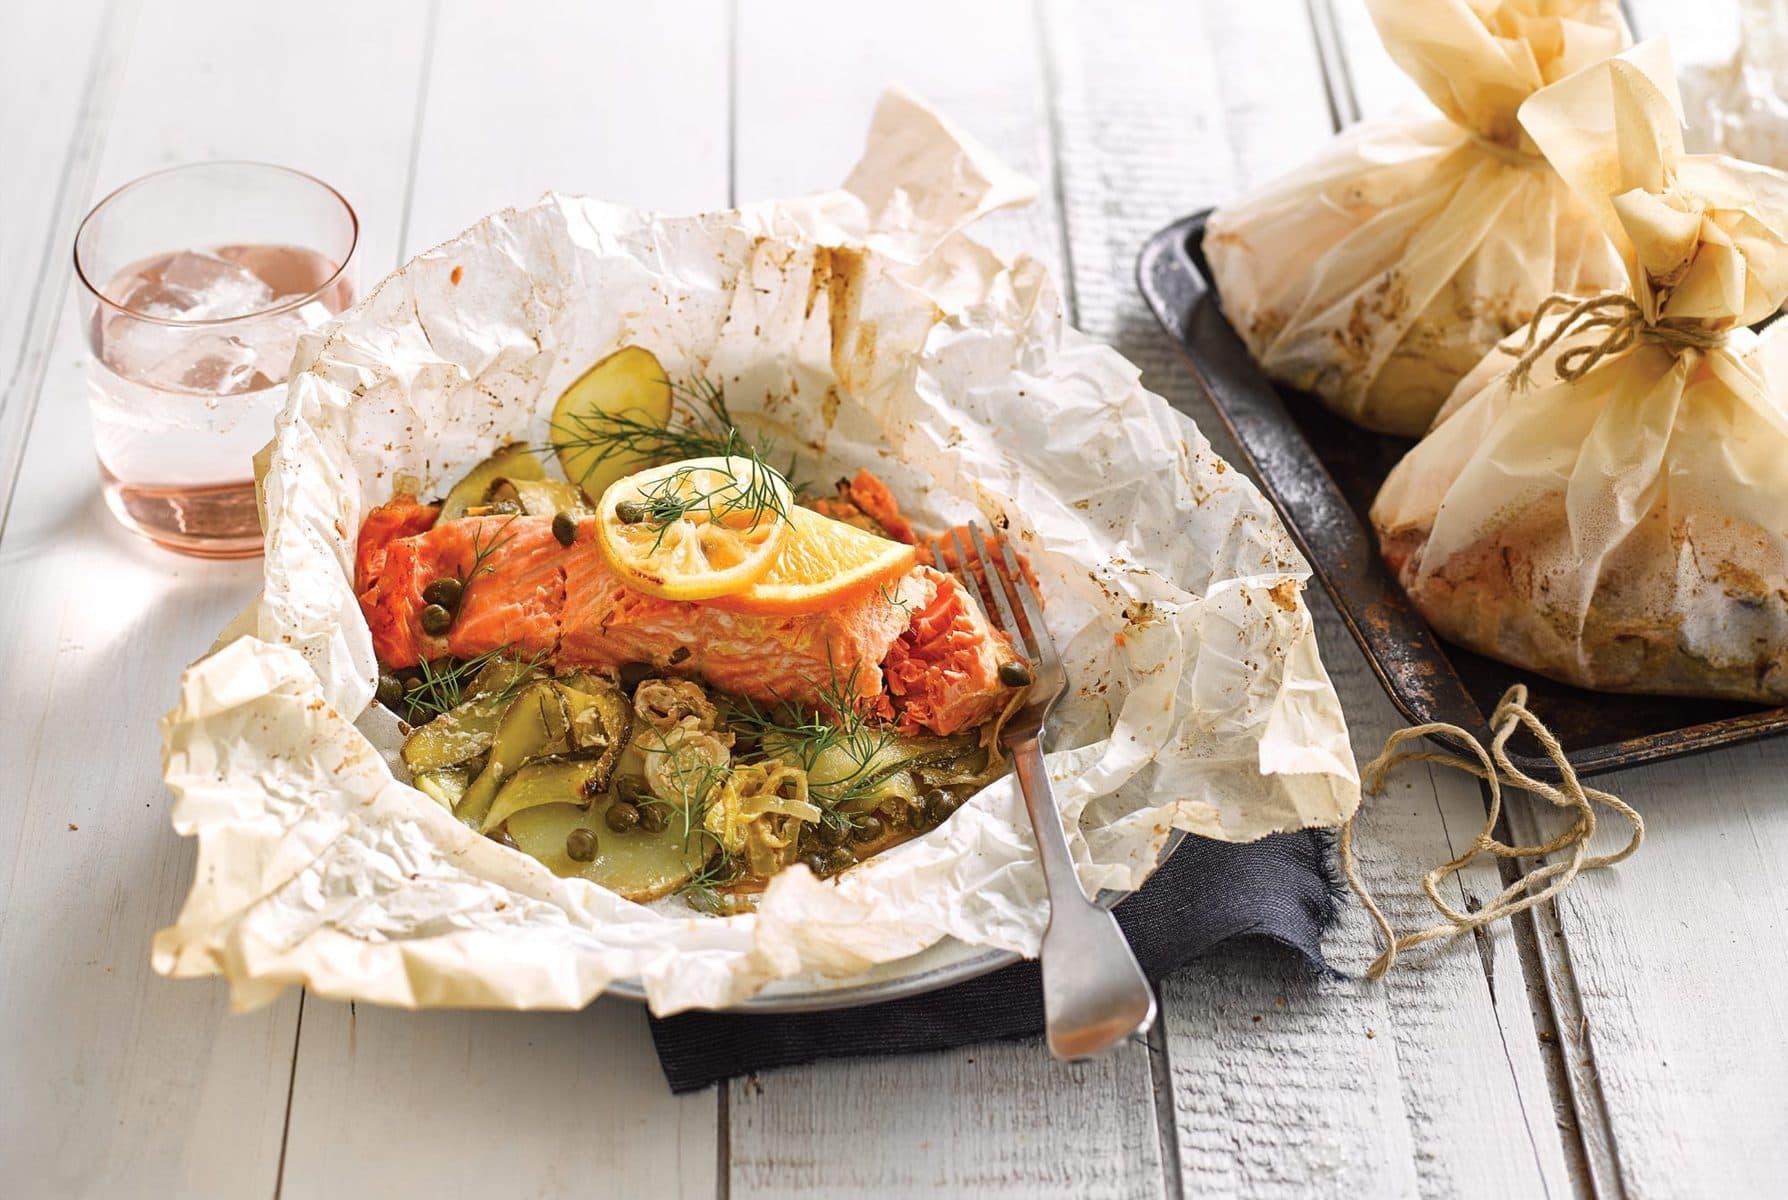 Salmon and potato parcels